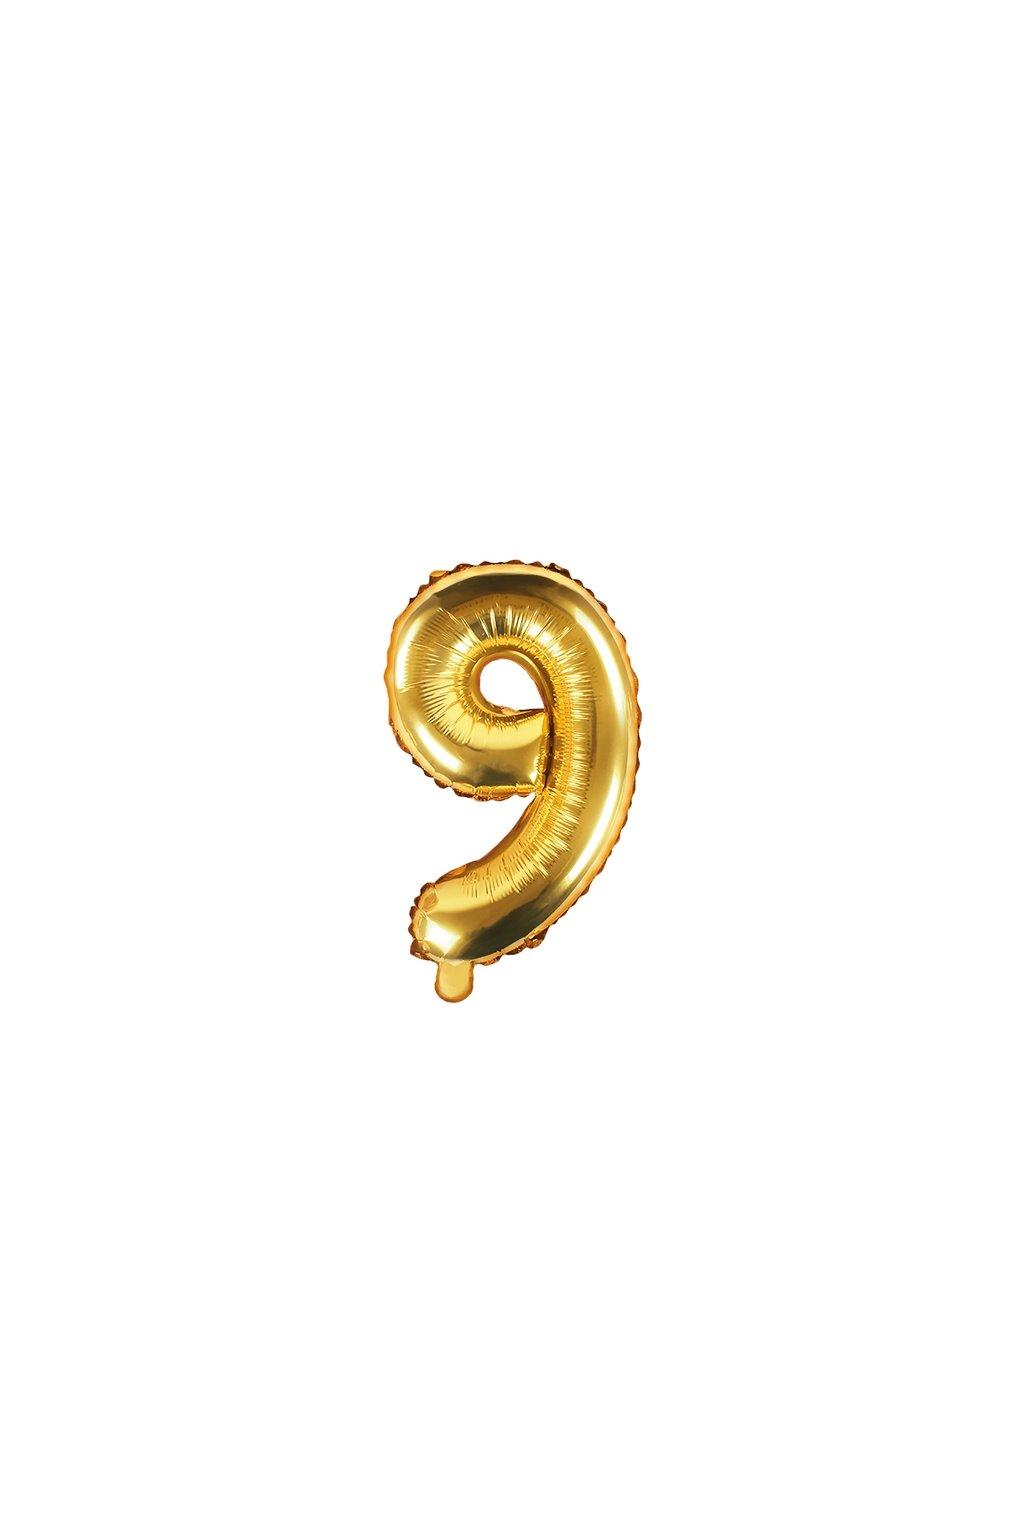 Fóliový balónek číslo 9 - zlatý 35cm